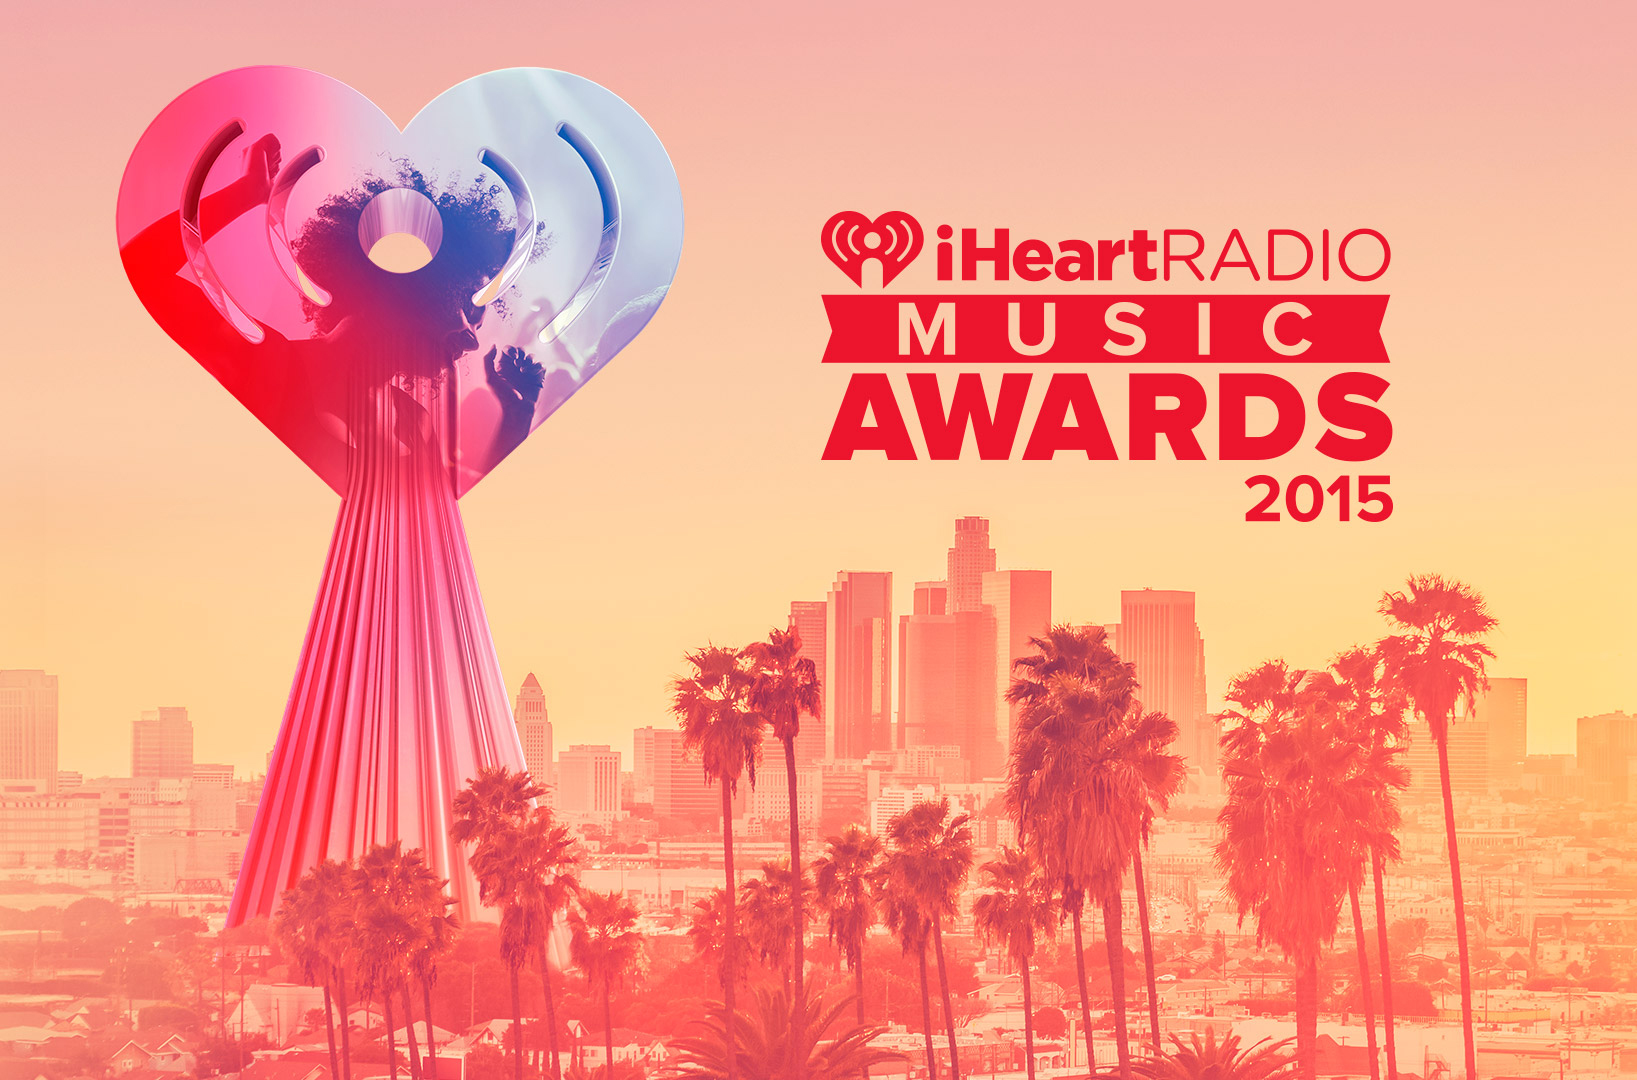 The iHeartRadio Music Awards 2015